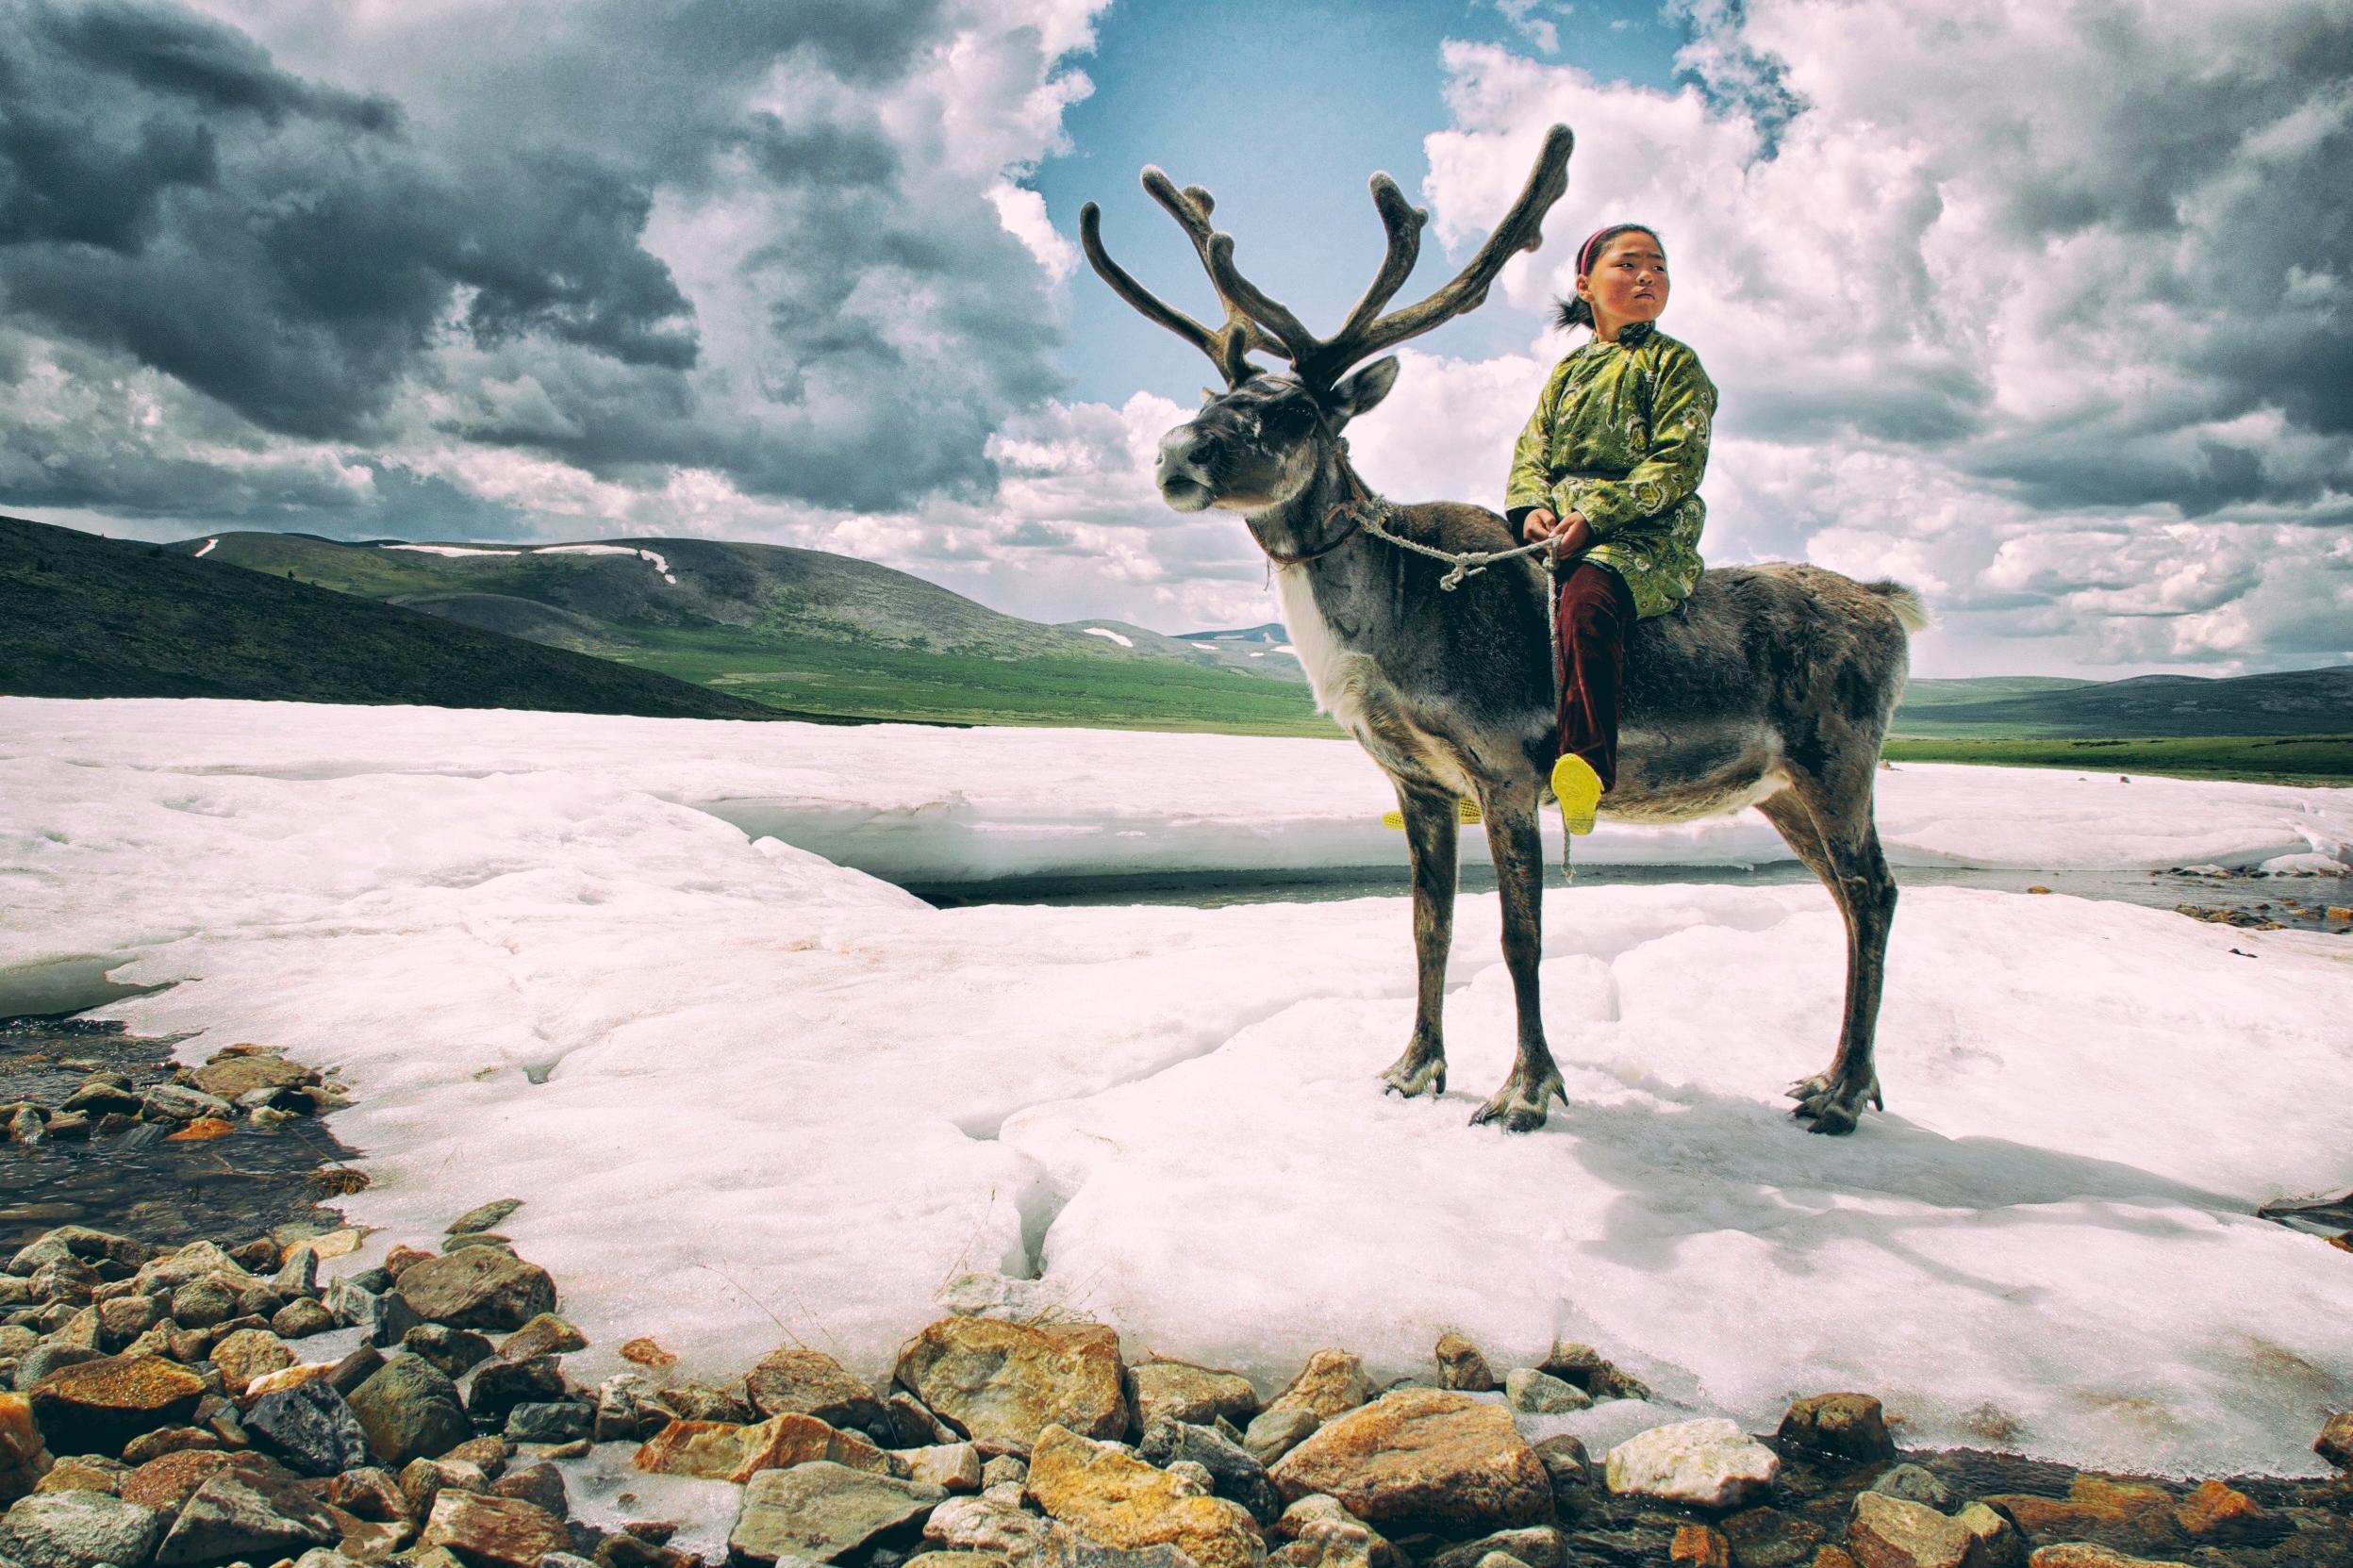 Khasar_S_SuvdaPortrait_BrownReindeer_UlaanTaiga_Huvsgul_Mongolia_Summer_2013.jpg